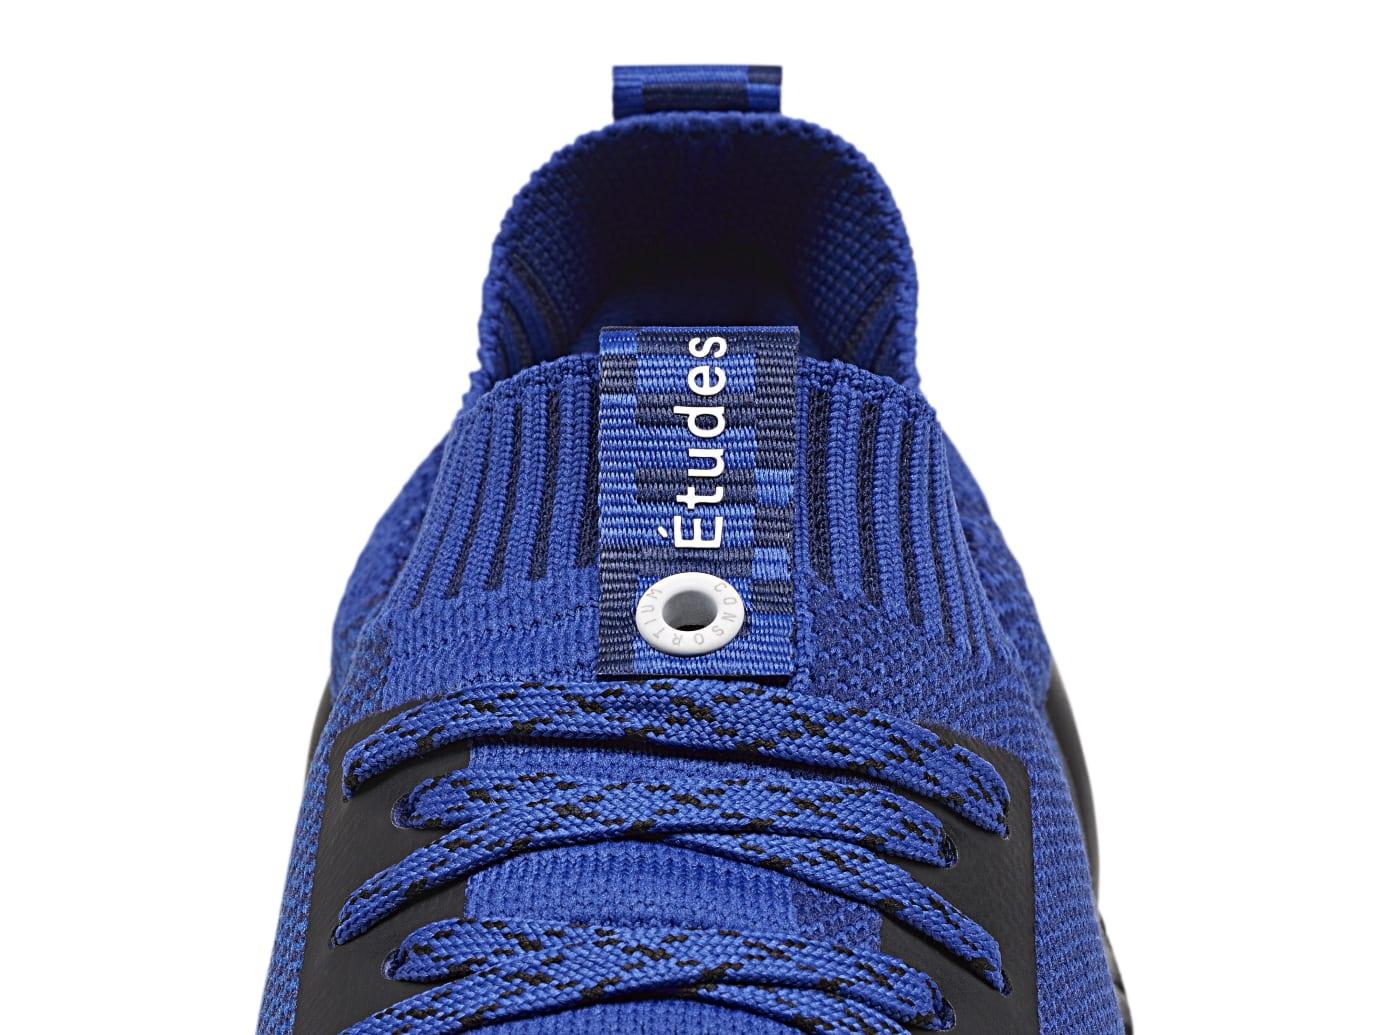 Image via Adidas Études x Adidas Consortium Ultra Boost Uncaged D97732  (Tongue) 9a767148f6c5